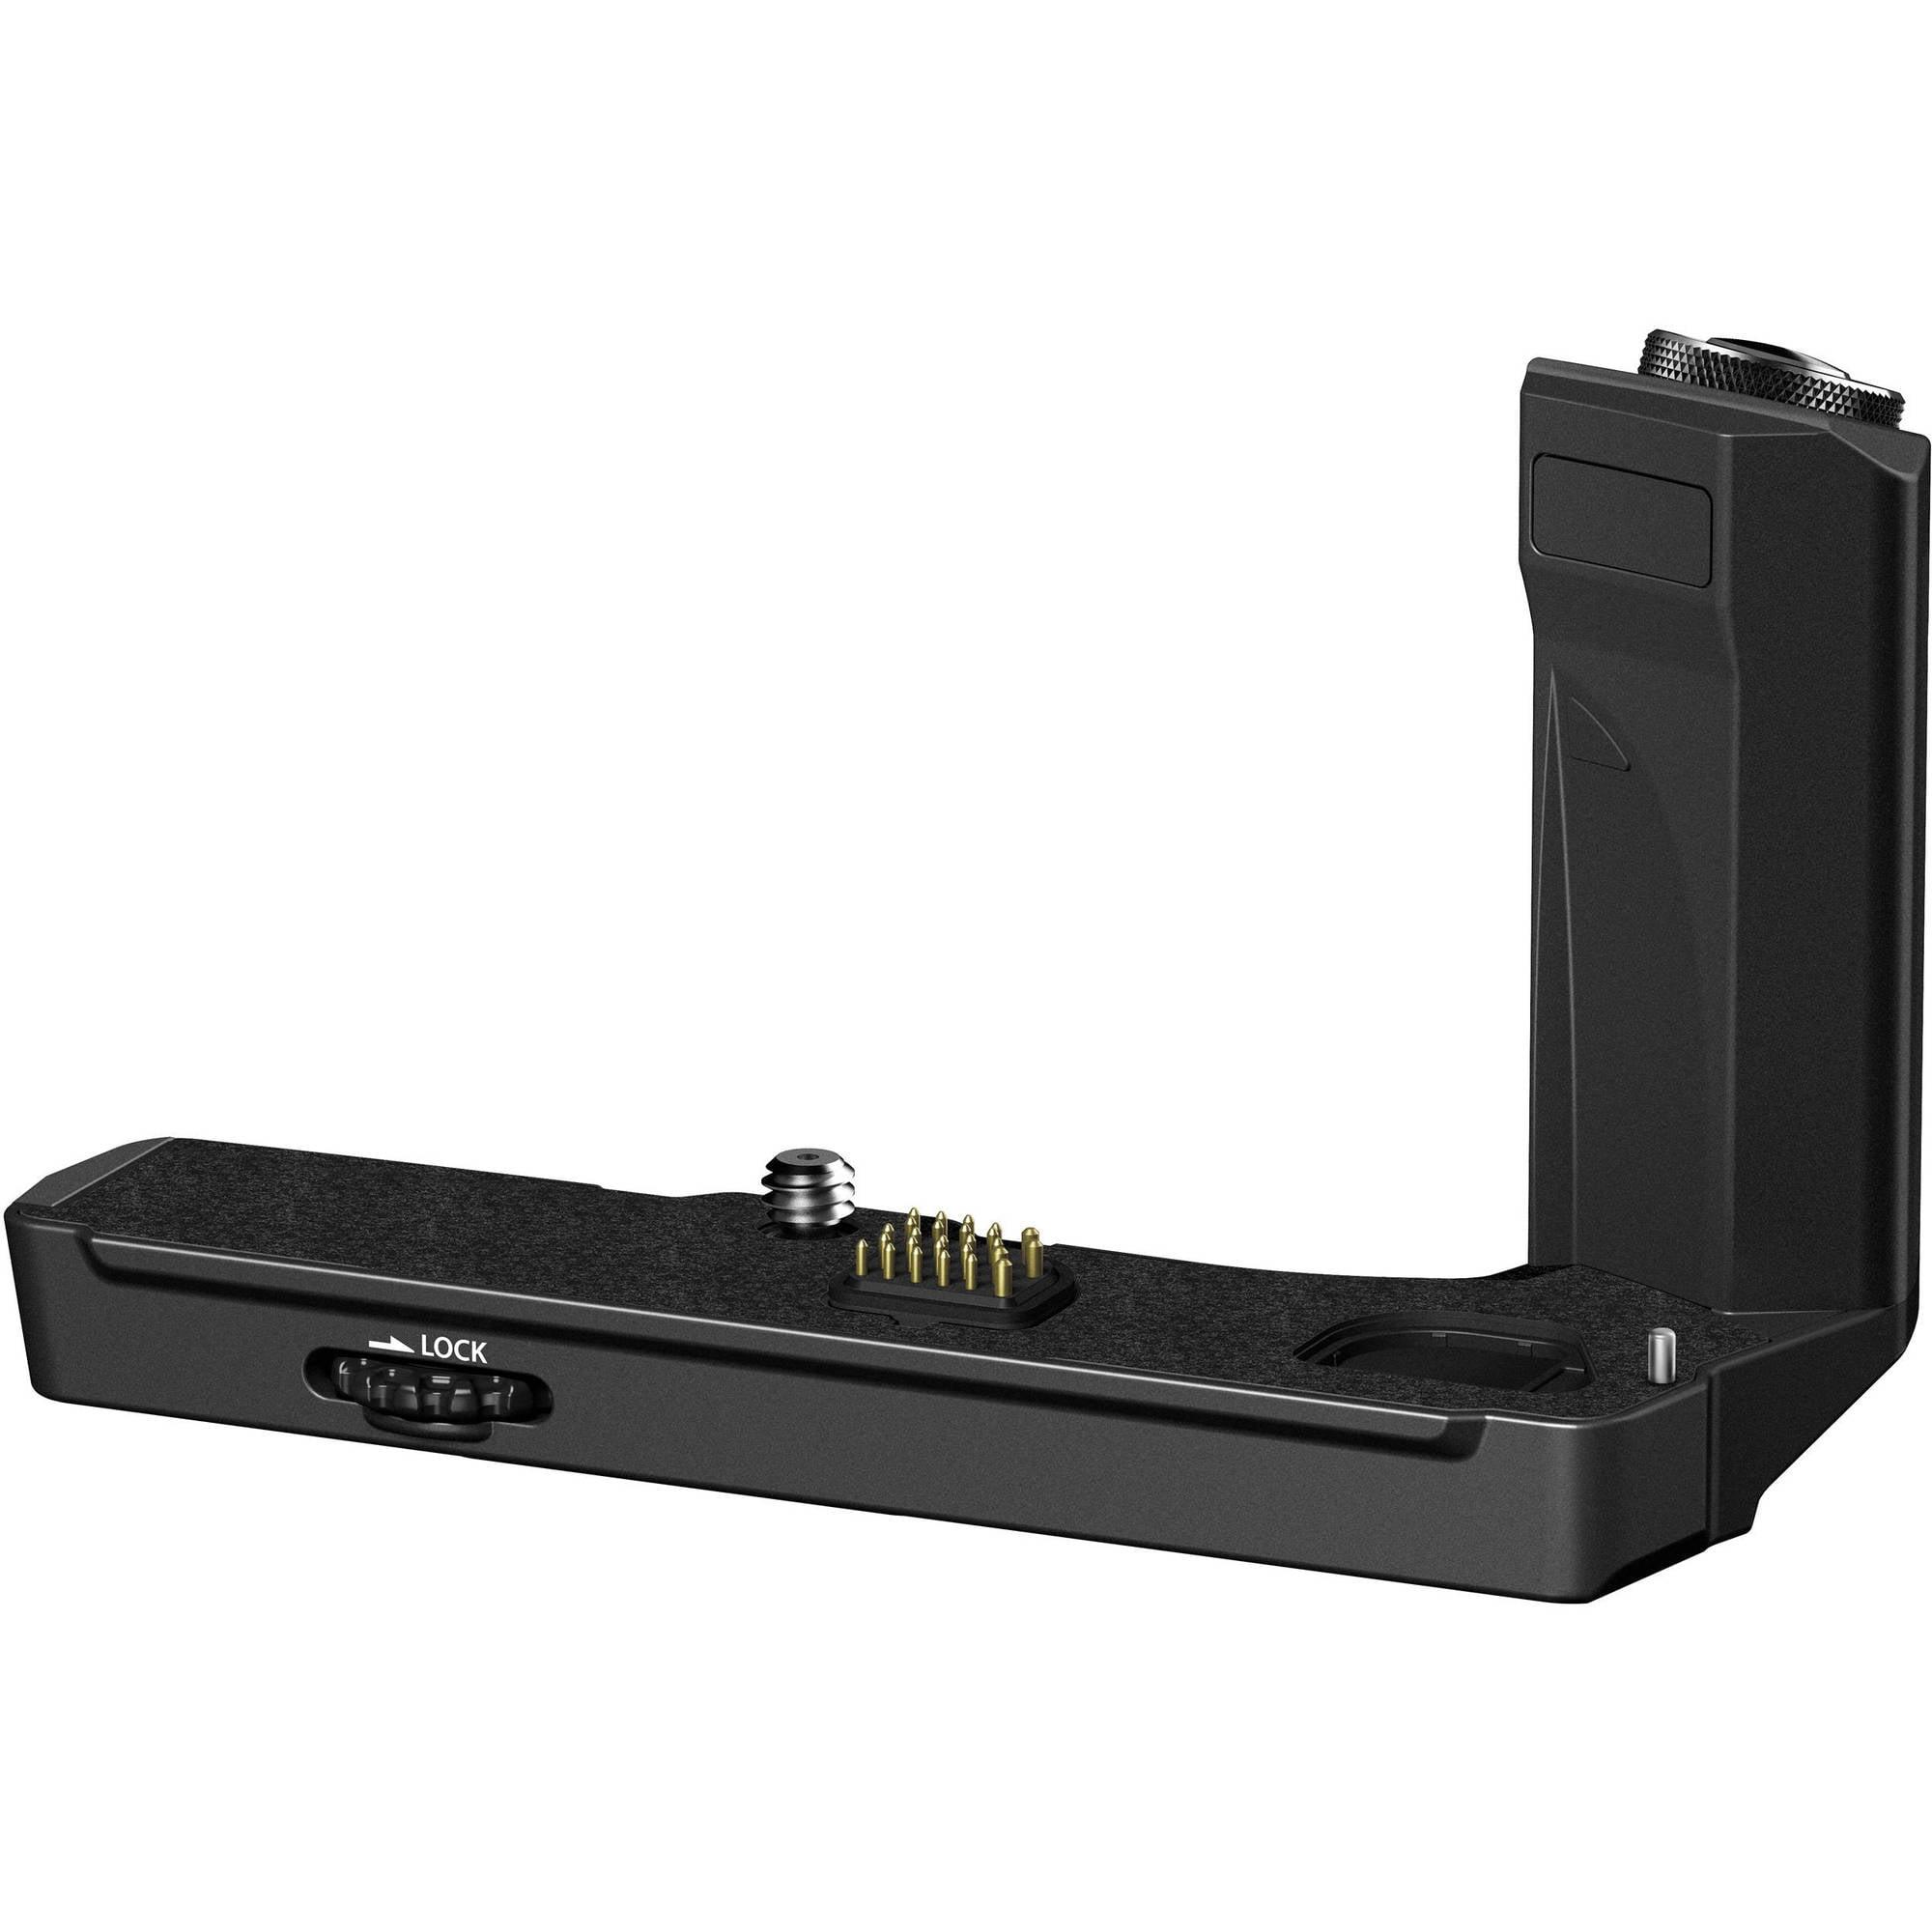 Olympus HLD-8G Grip for OM-D E-M5 Mark II Camera